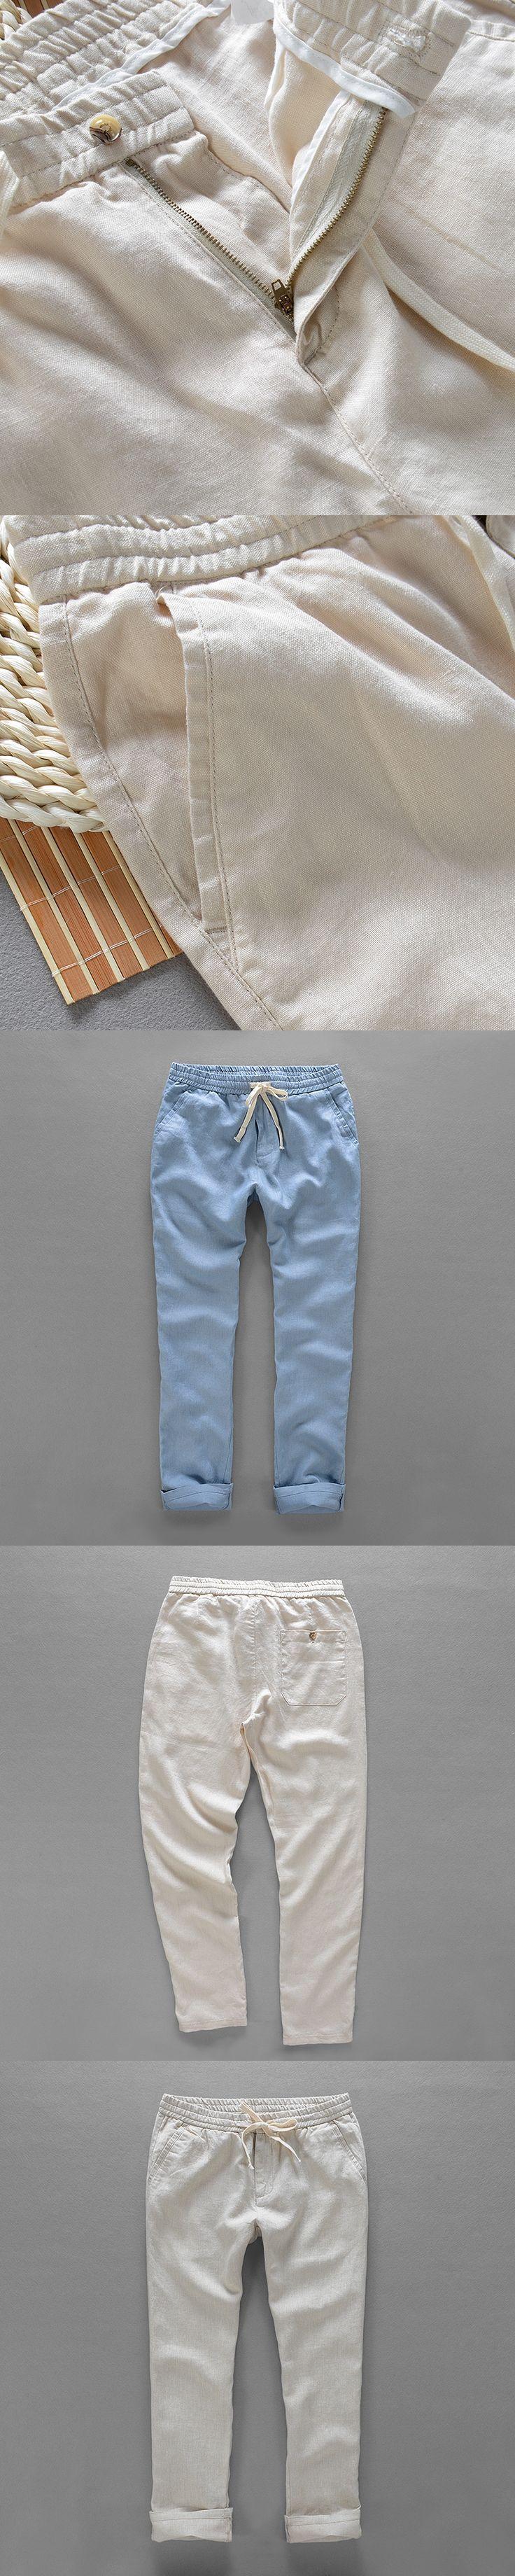 Brazil style pure linen pants men brand fashion men trousers loose casul pants mens 40 size 5 colors mens trousers flax pantalon